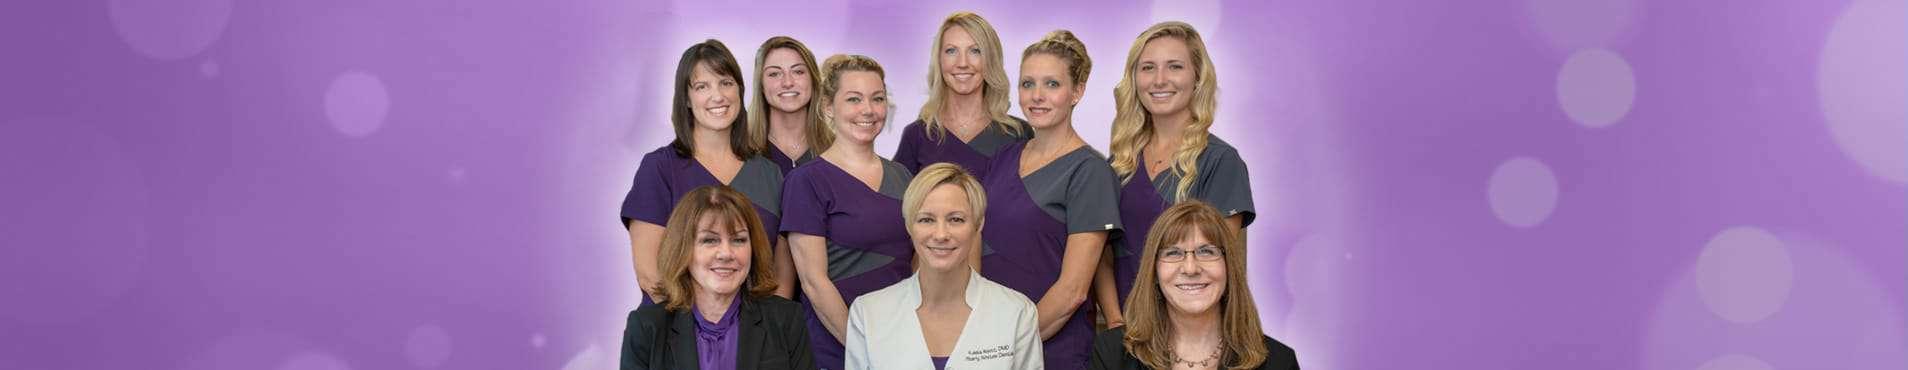 Dental Crowns Dentist Serving Bristol